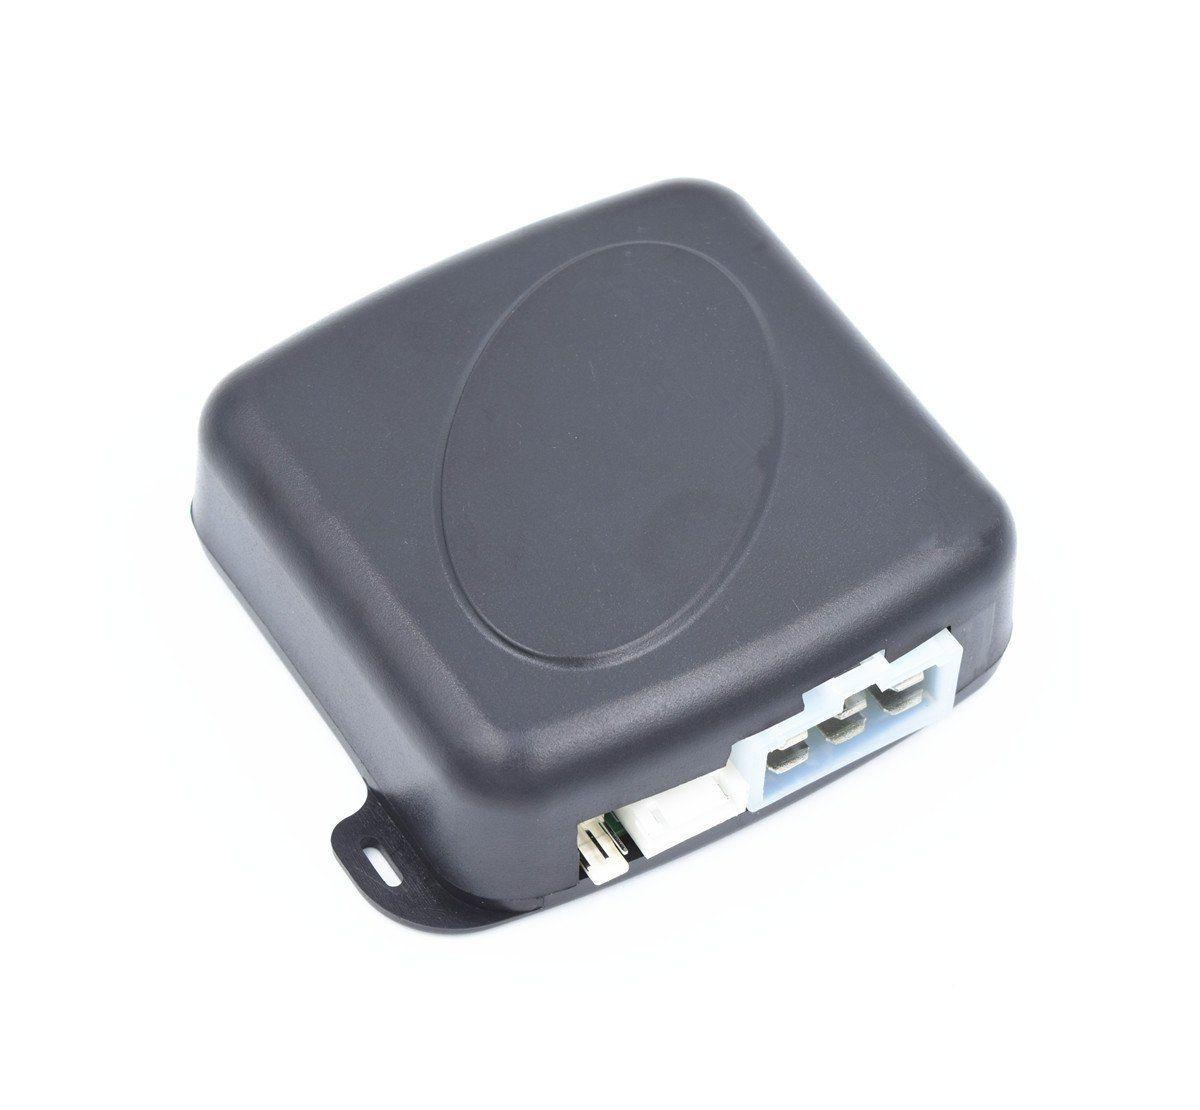 Amazing Auto Car Alarm System Security Keyless Entry Engine Start Push Button Remote Kit 2017